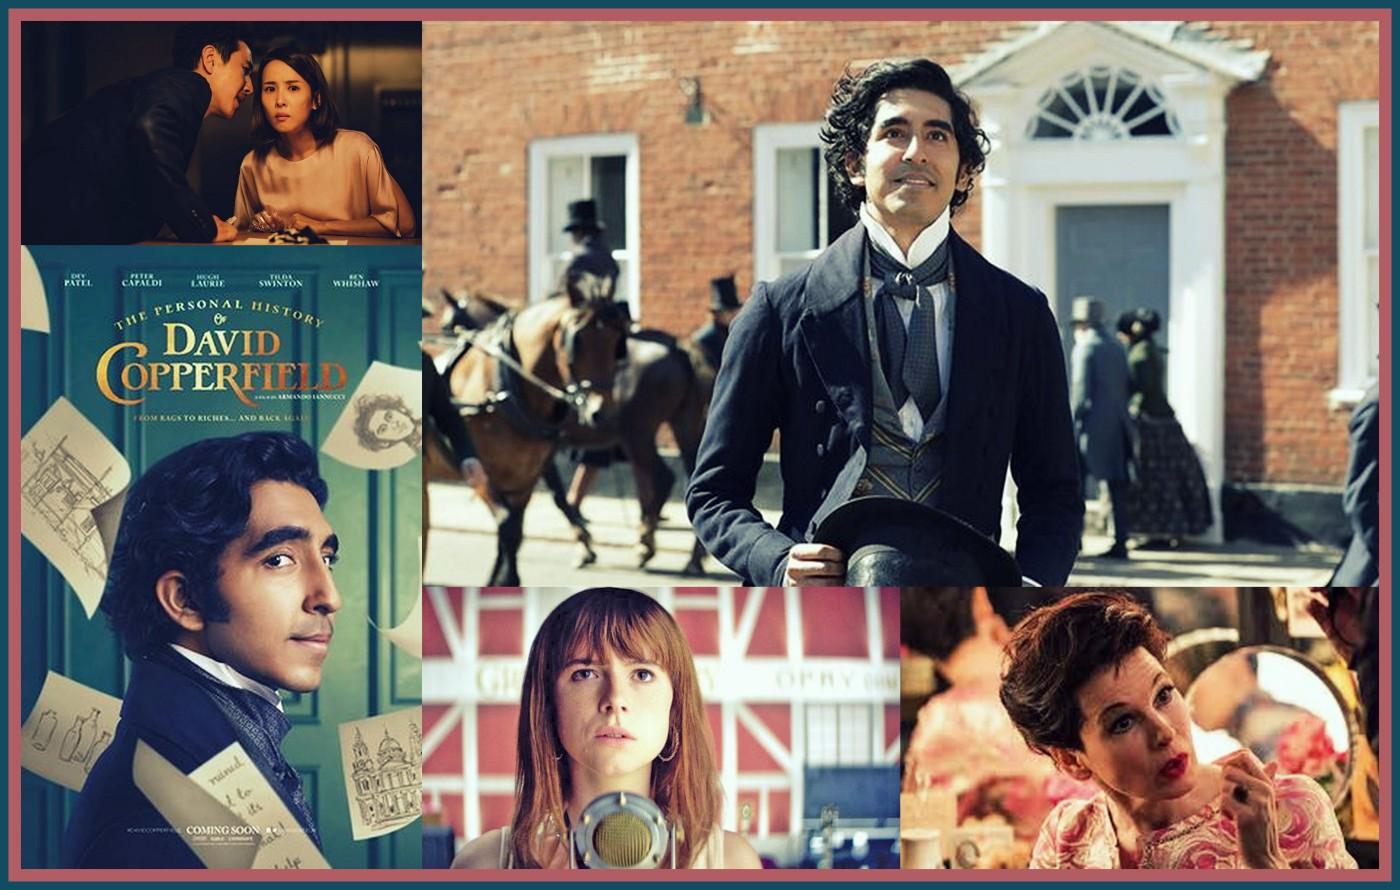 La storia personale di David Copperfield conquista 11 nominations ai British Independent Film Awards 2019